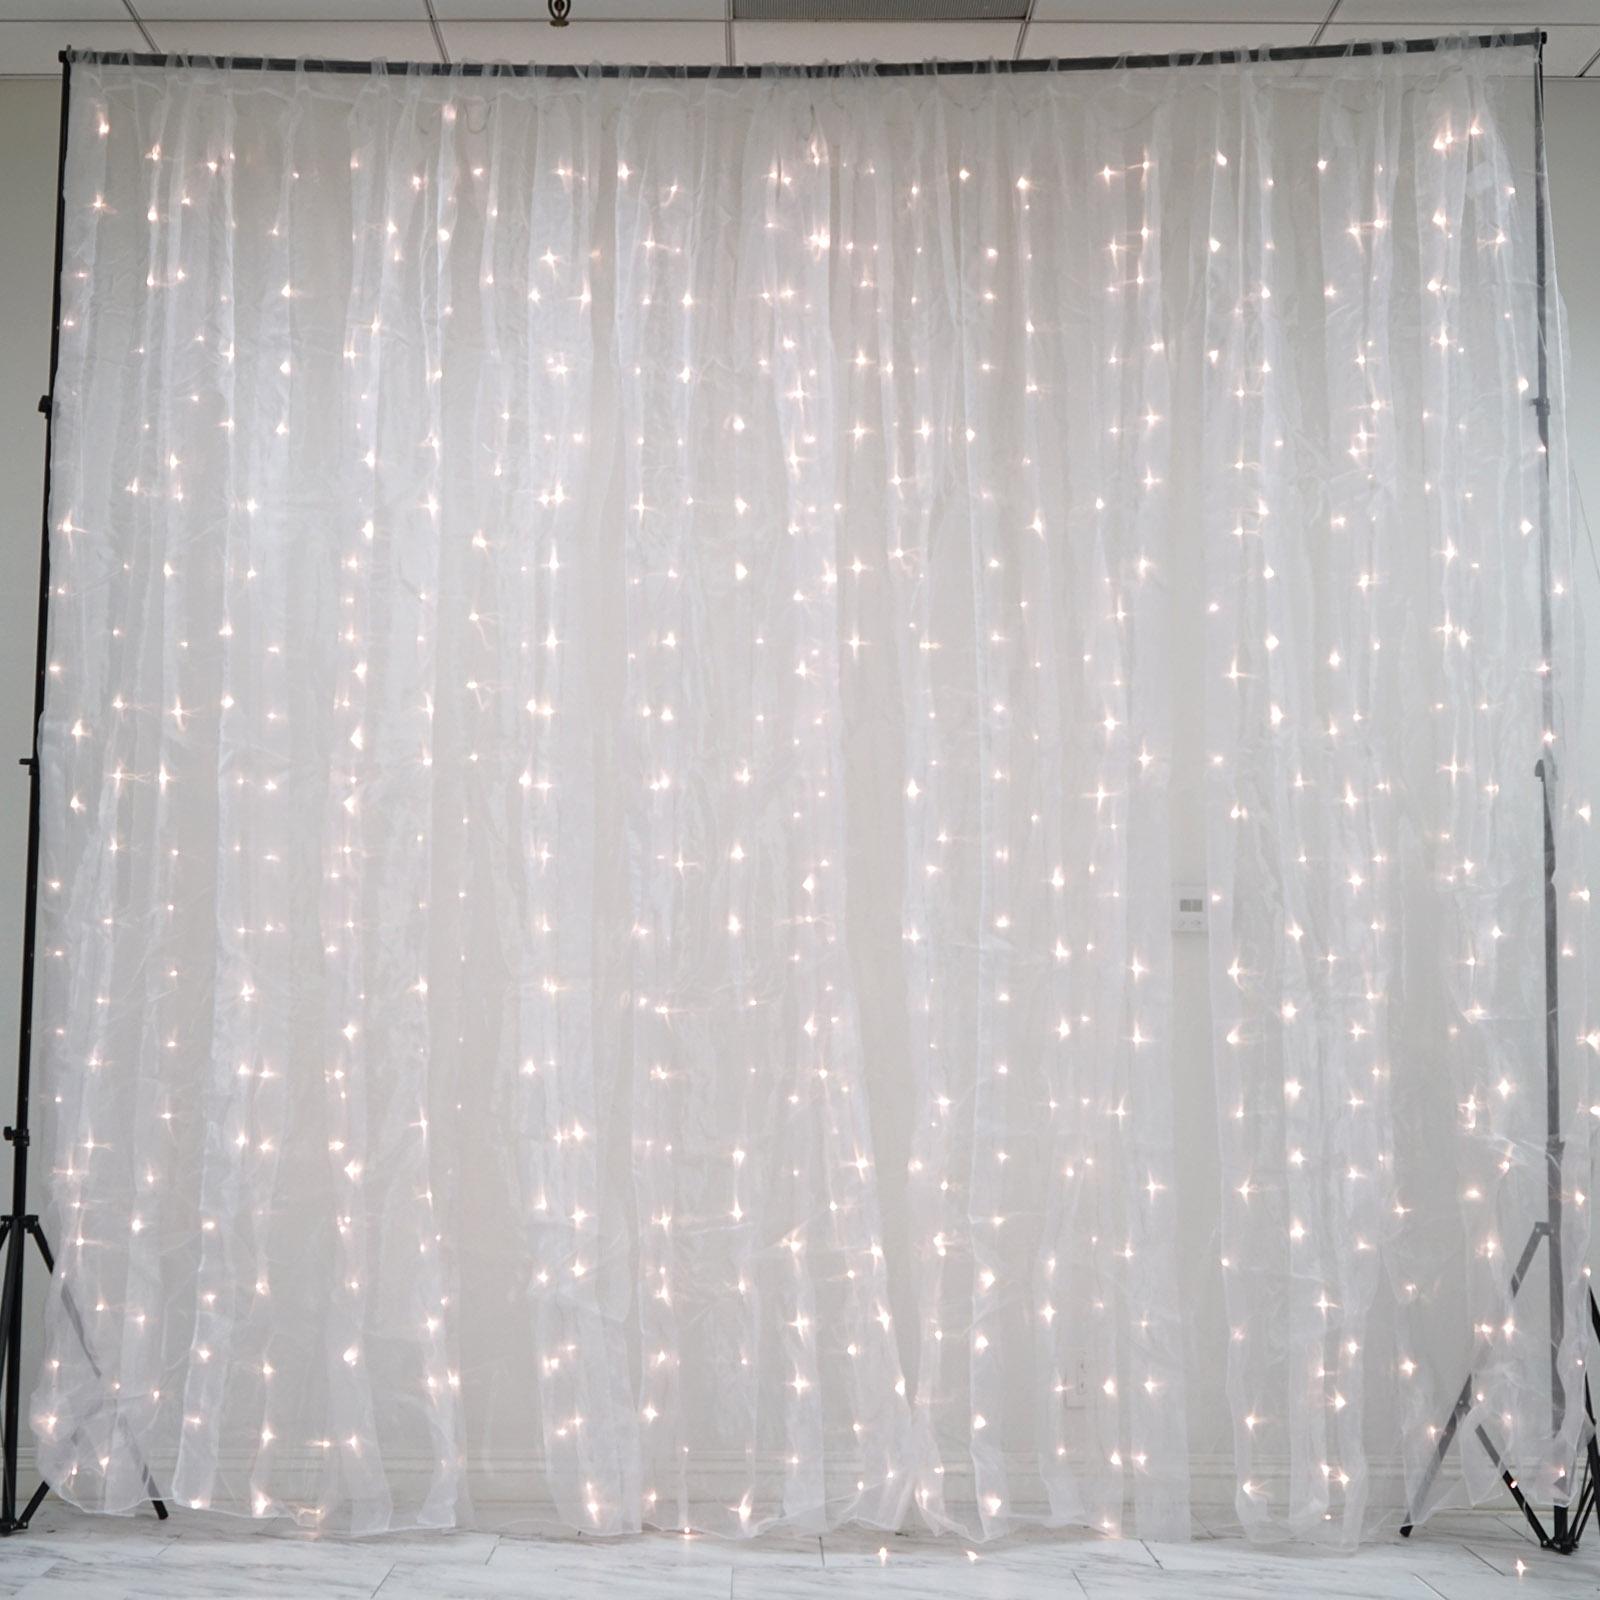 Backdrop 20ft x 10ft organza led lights photo background - Led lights decoration ideas ...